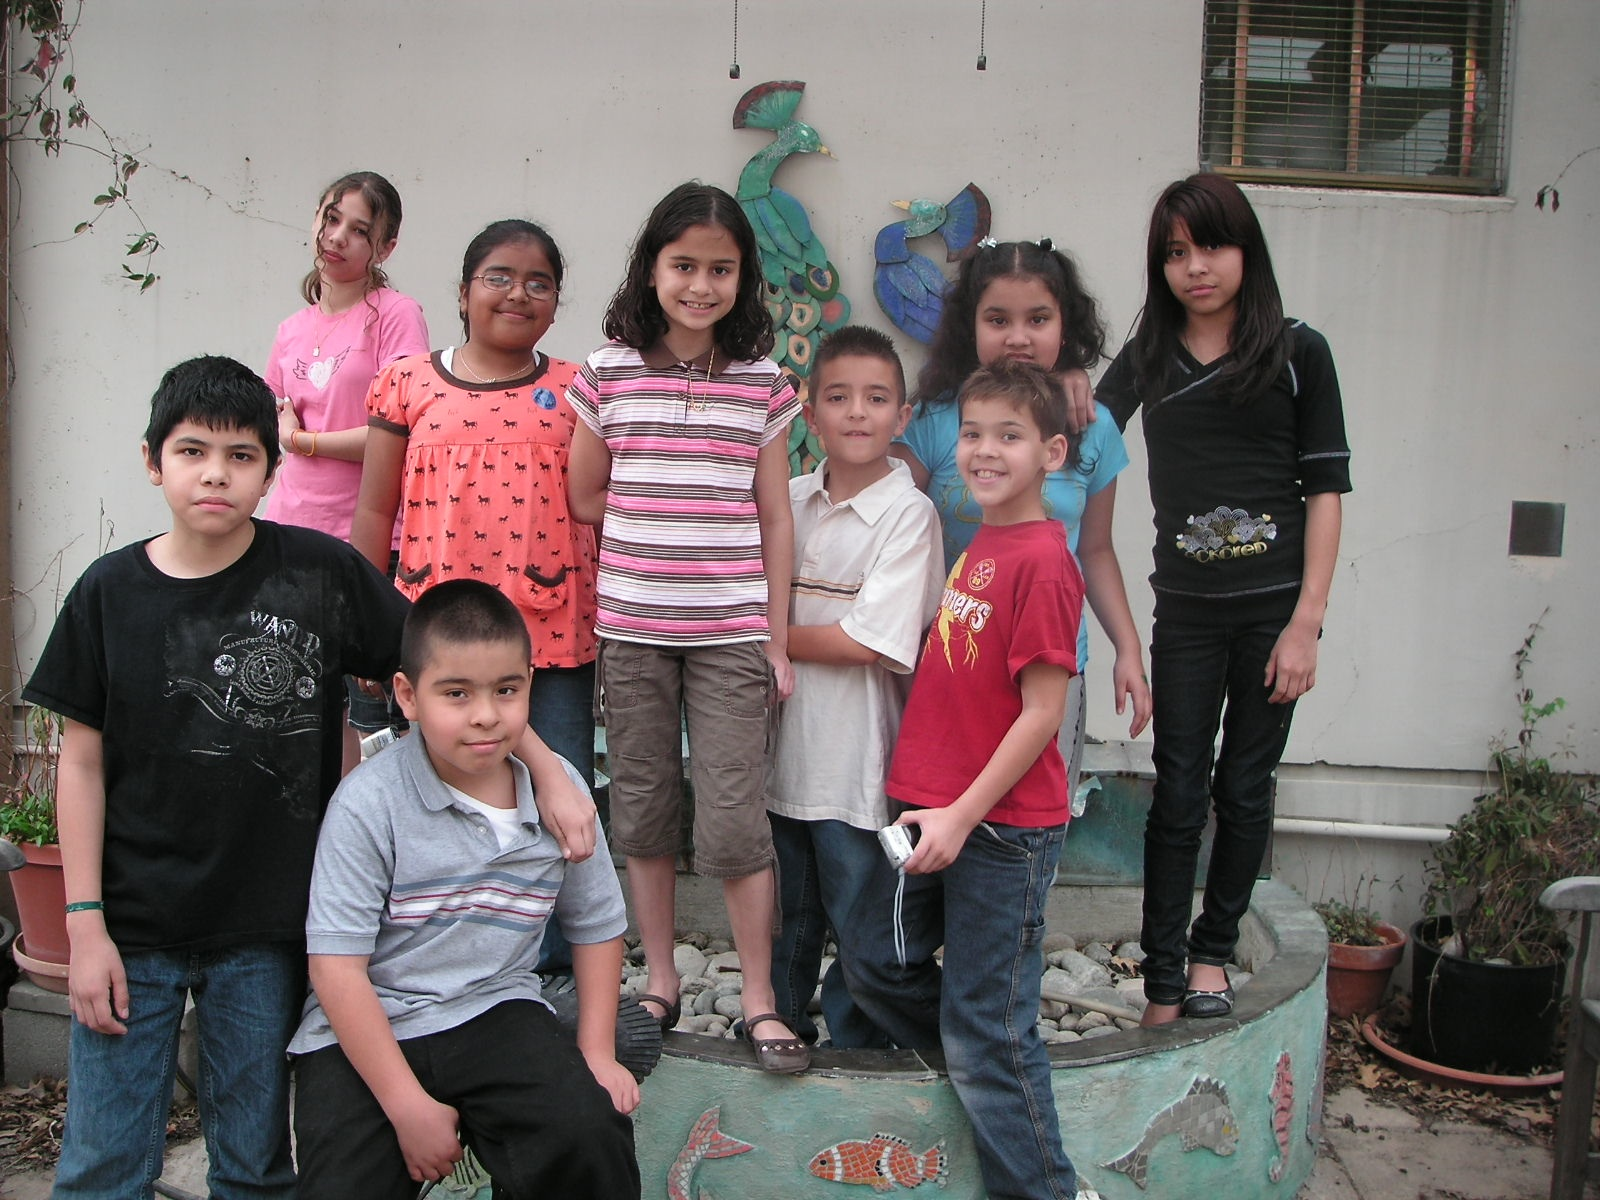 UnseenAmerica 09.jpg